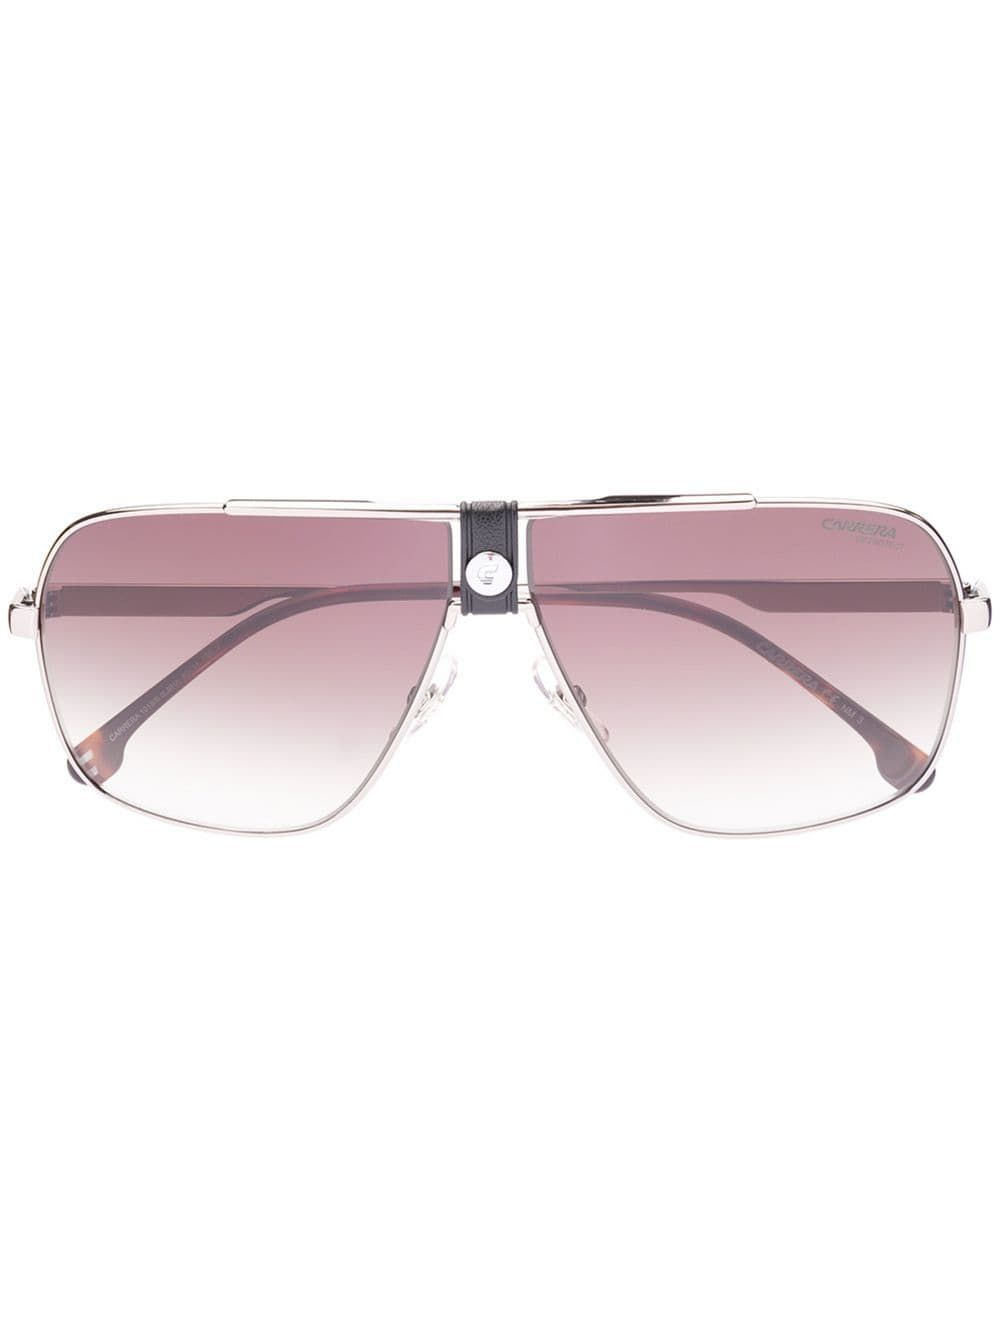 dc24a79433d4 Carrera rectangle aviator frame sunglasses - Brown in 2019 ...